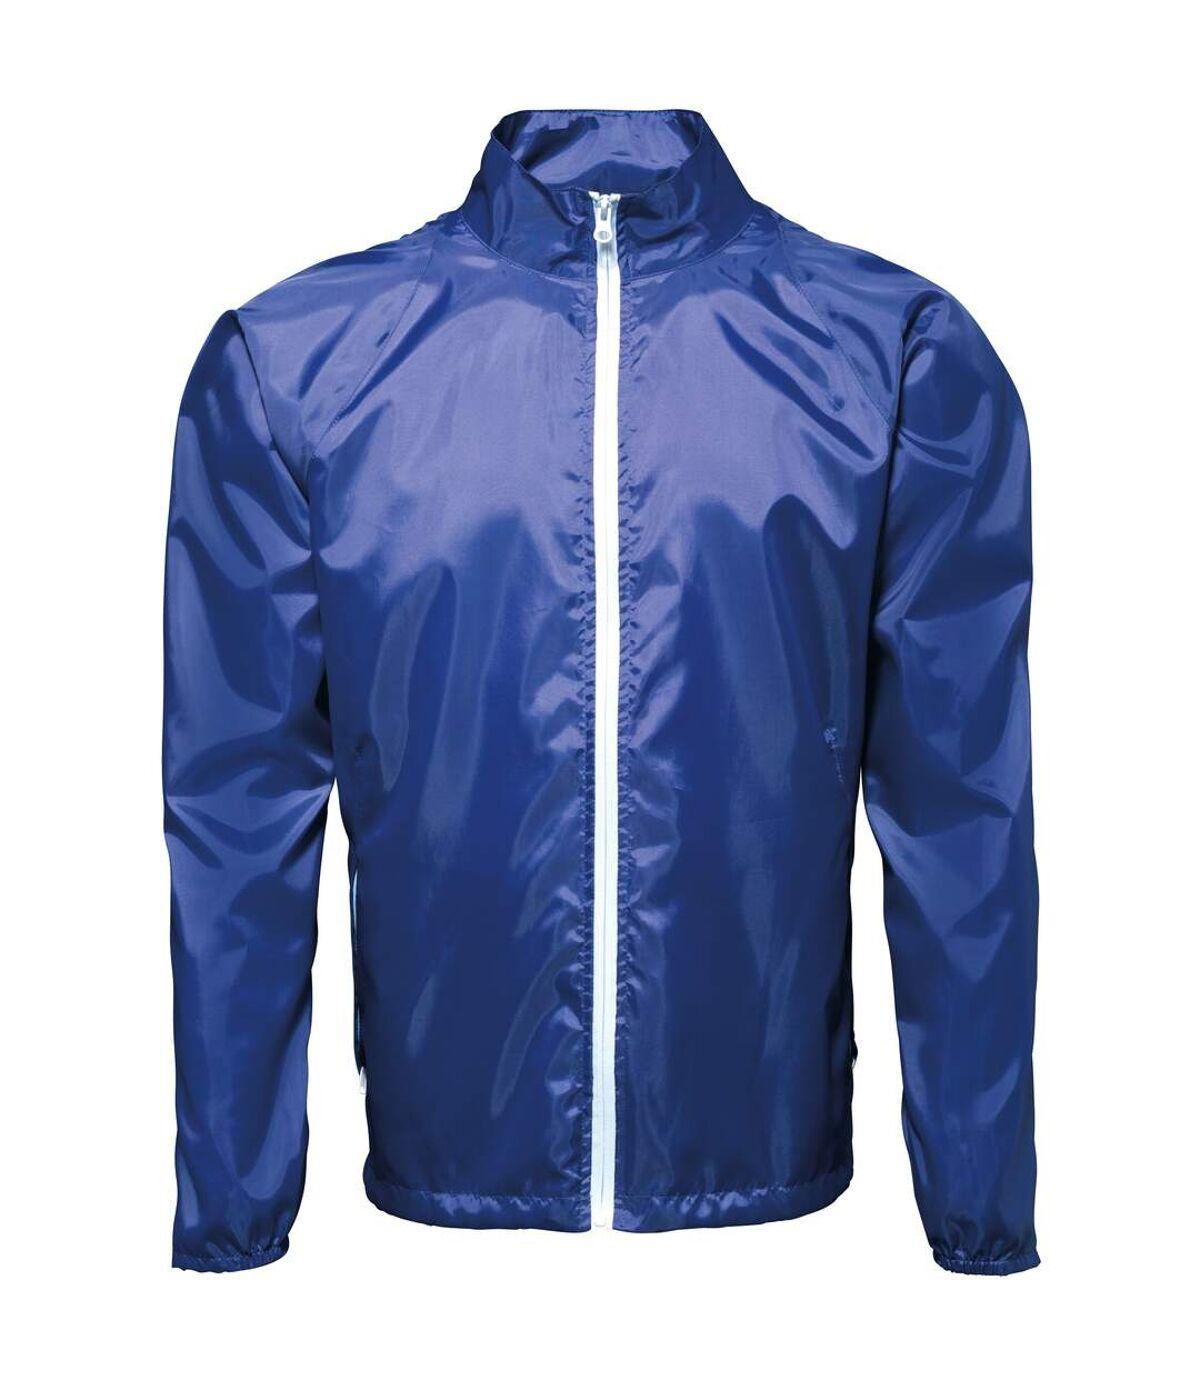 2786 Mens Contrast Lightweight Windcheater Shower Proof Jacket (Pack of 2) (Royal/ White) - UTRW7001